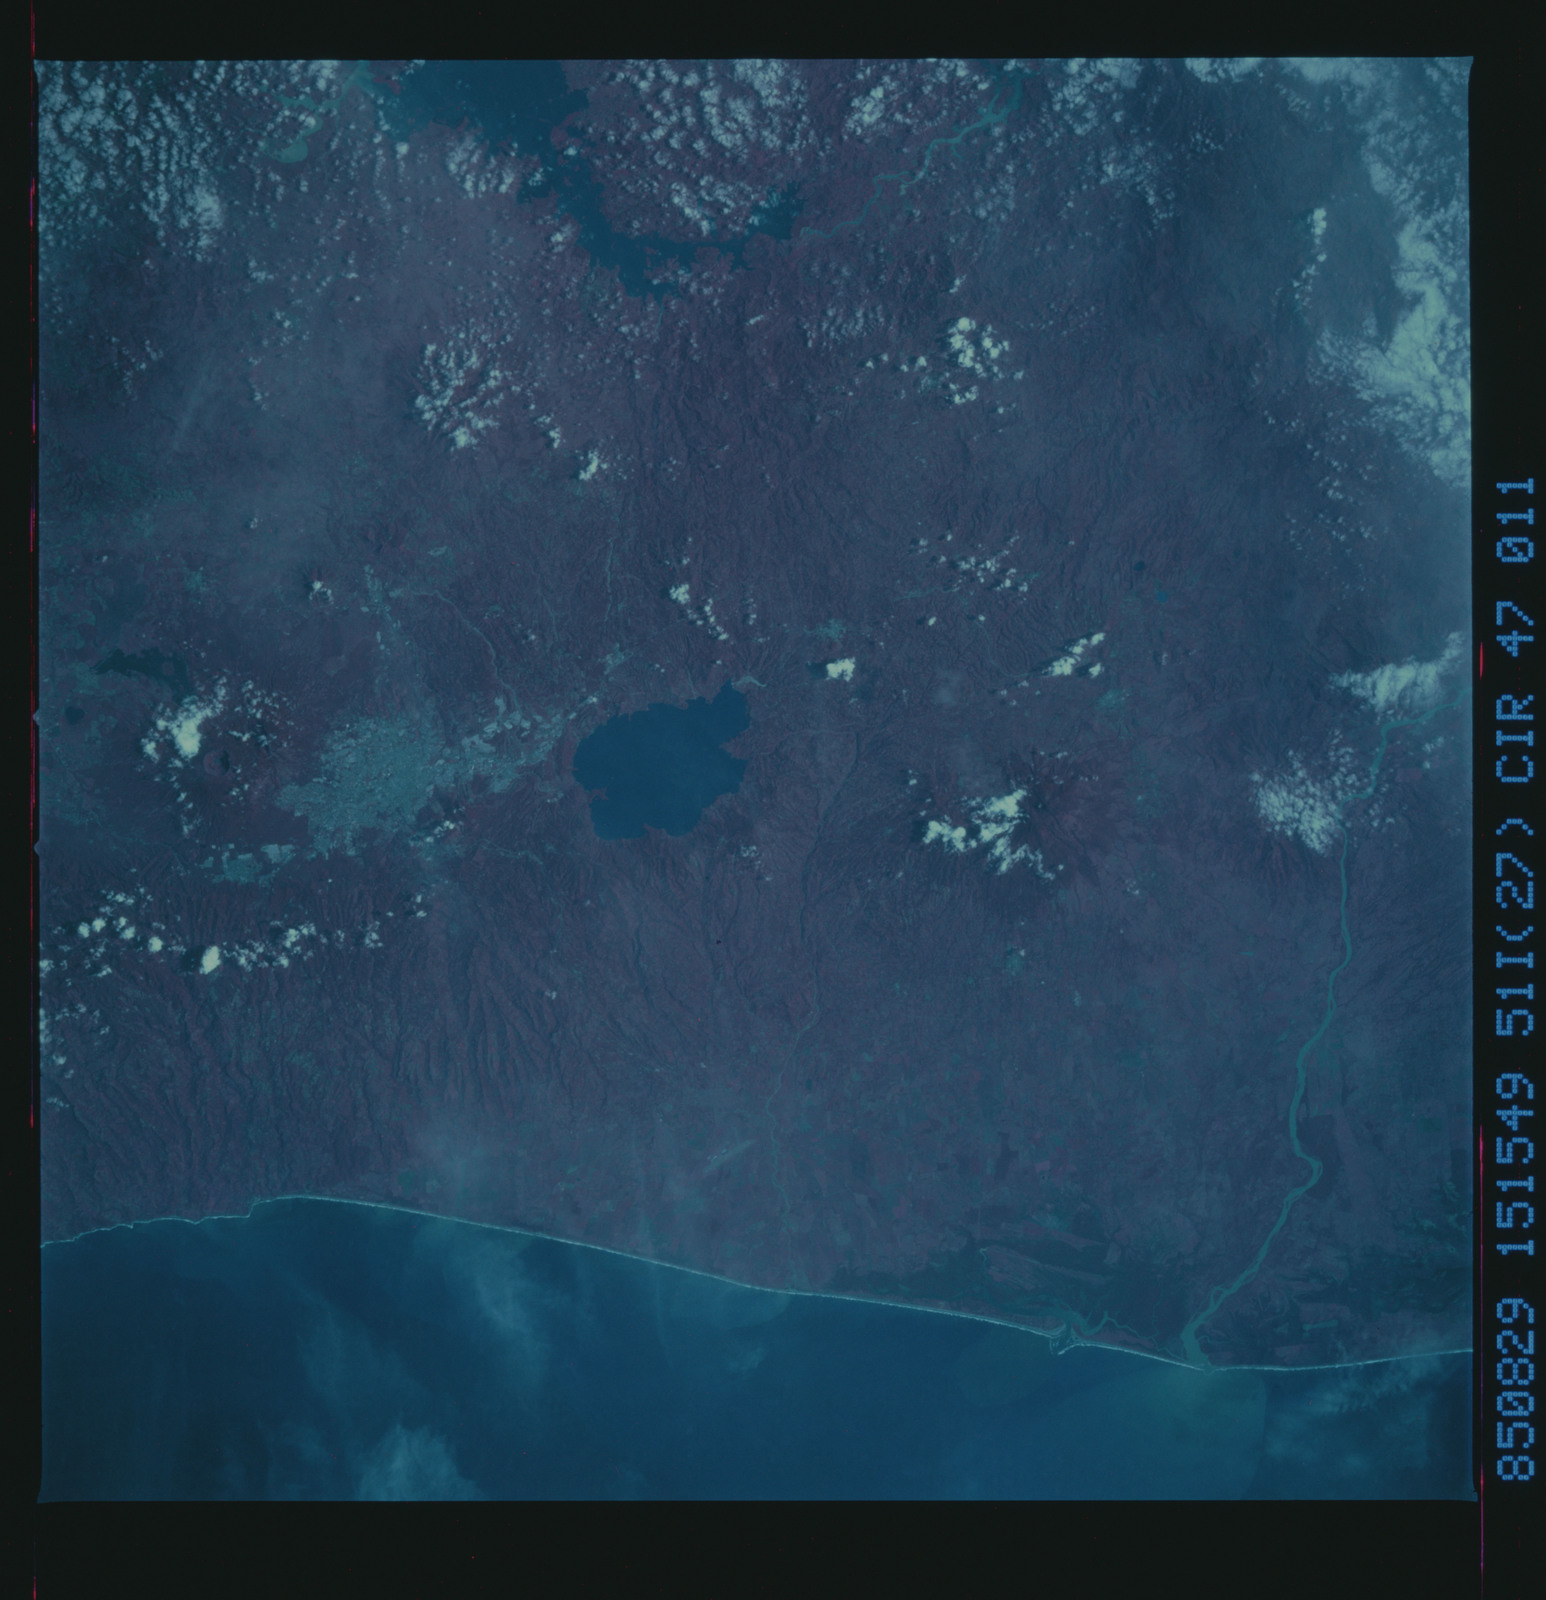 51I-47-011 - STS-51I - STS-51I earth observations